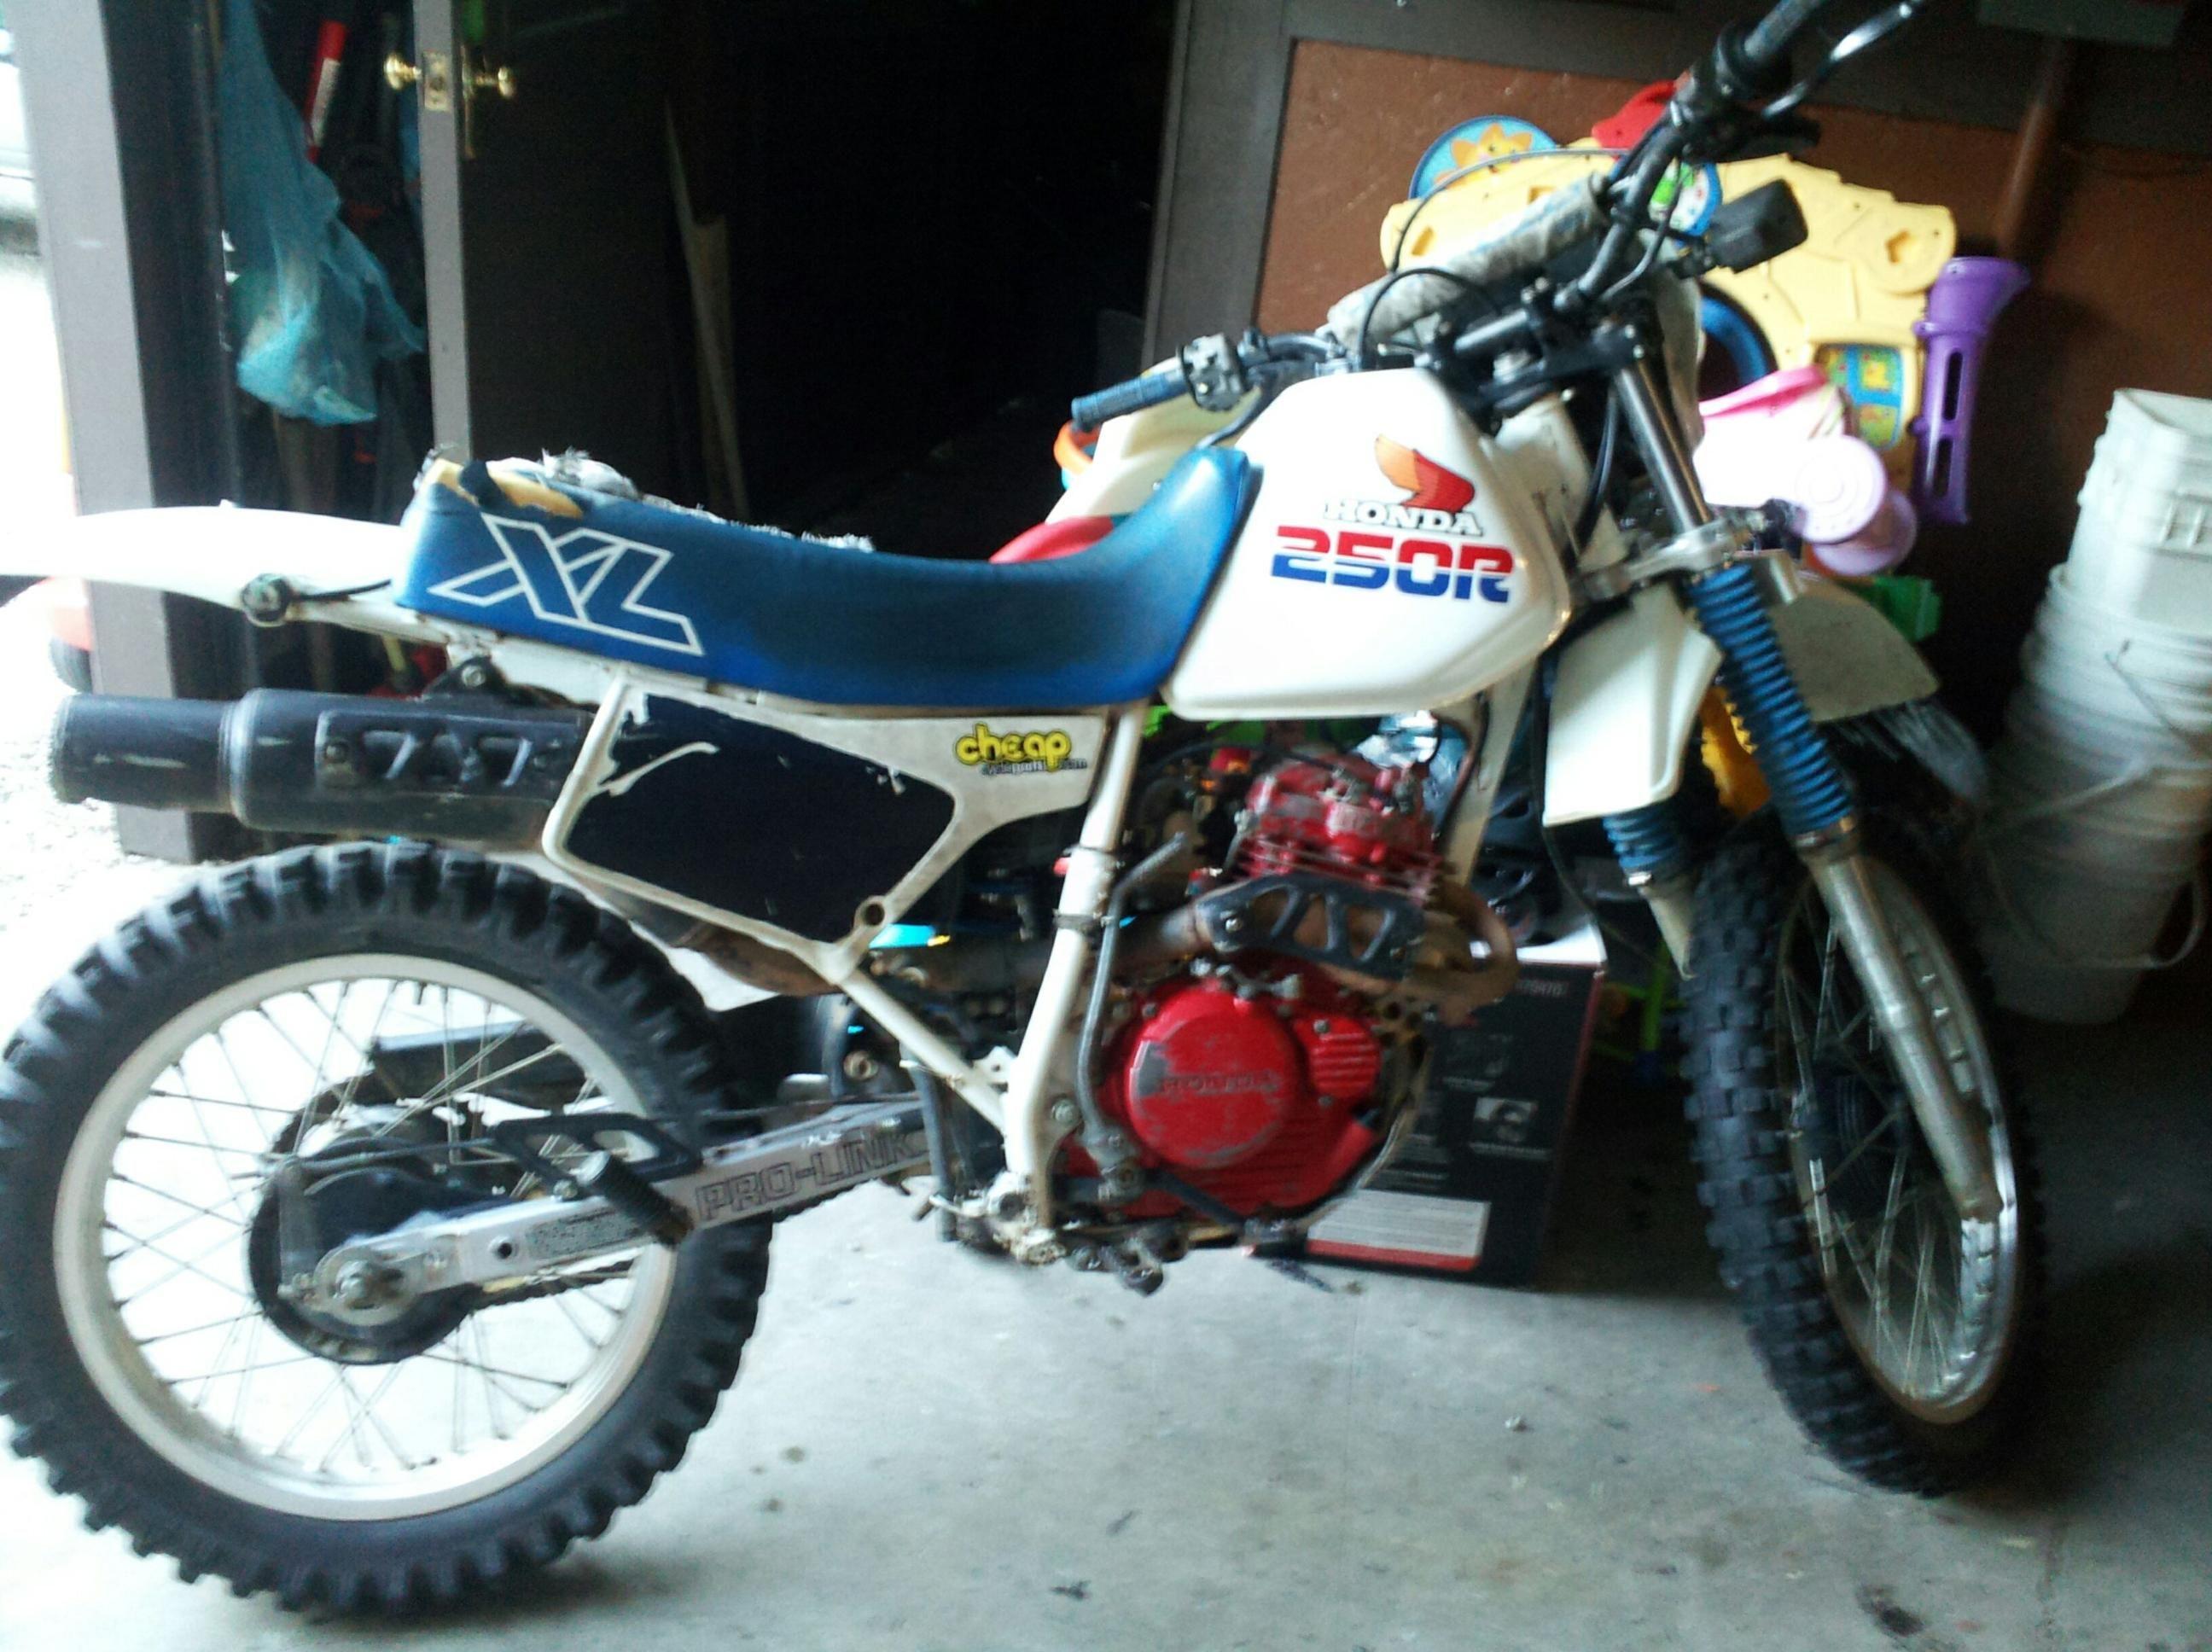 1986 Honda XL 250 R didn't ride this one so much. It was